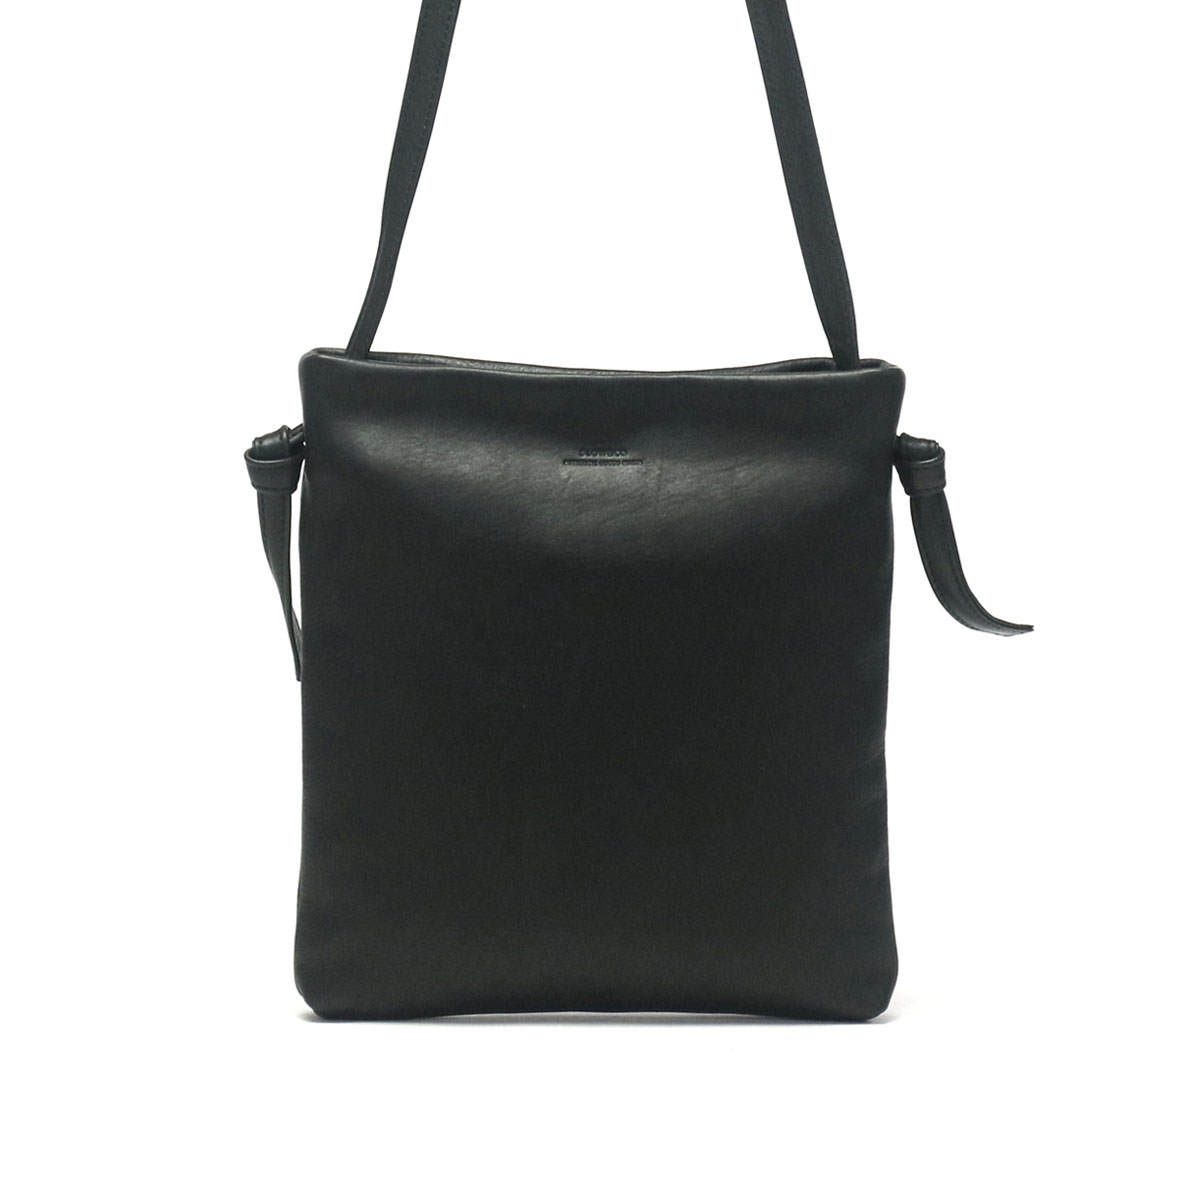 SLOW スロウ horse pit shoulder bag S ショルダーバッグ 49S232I